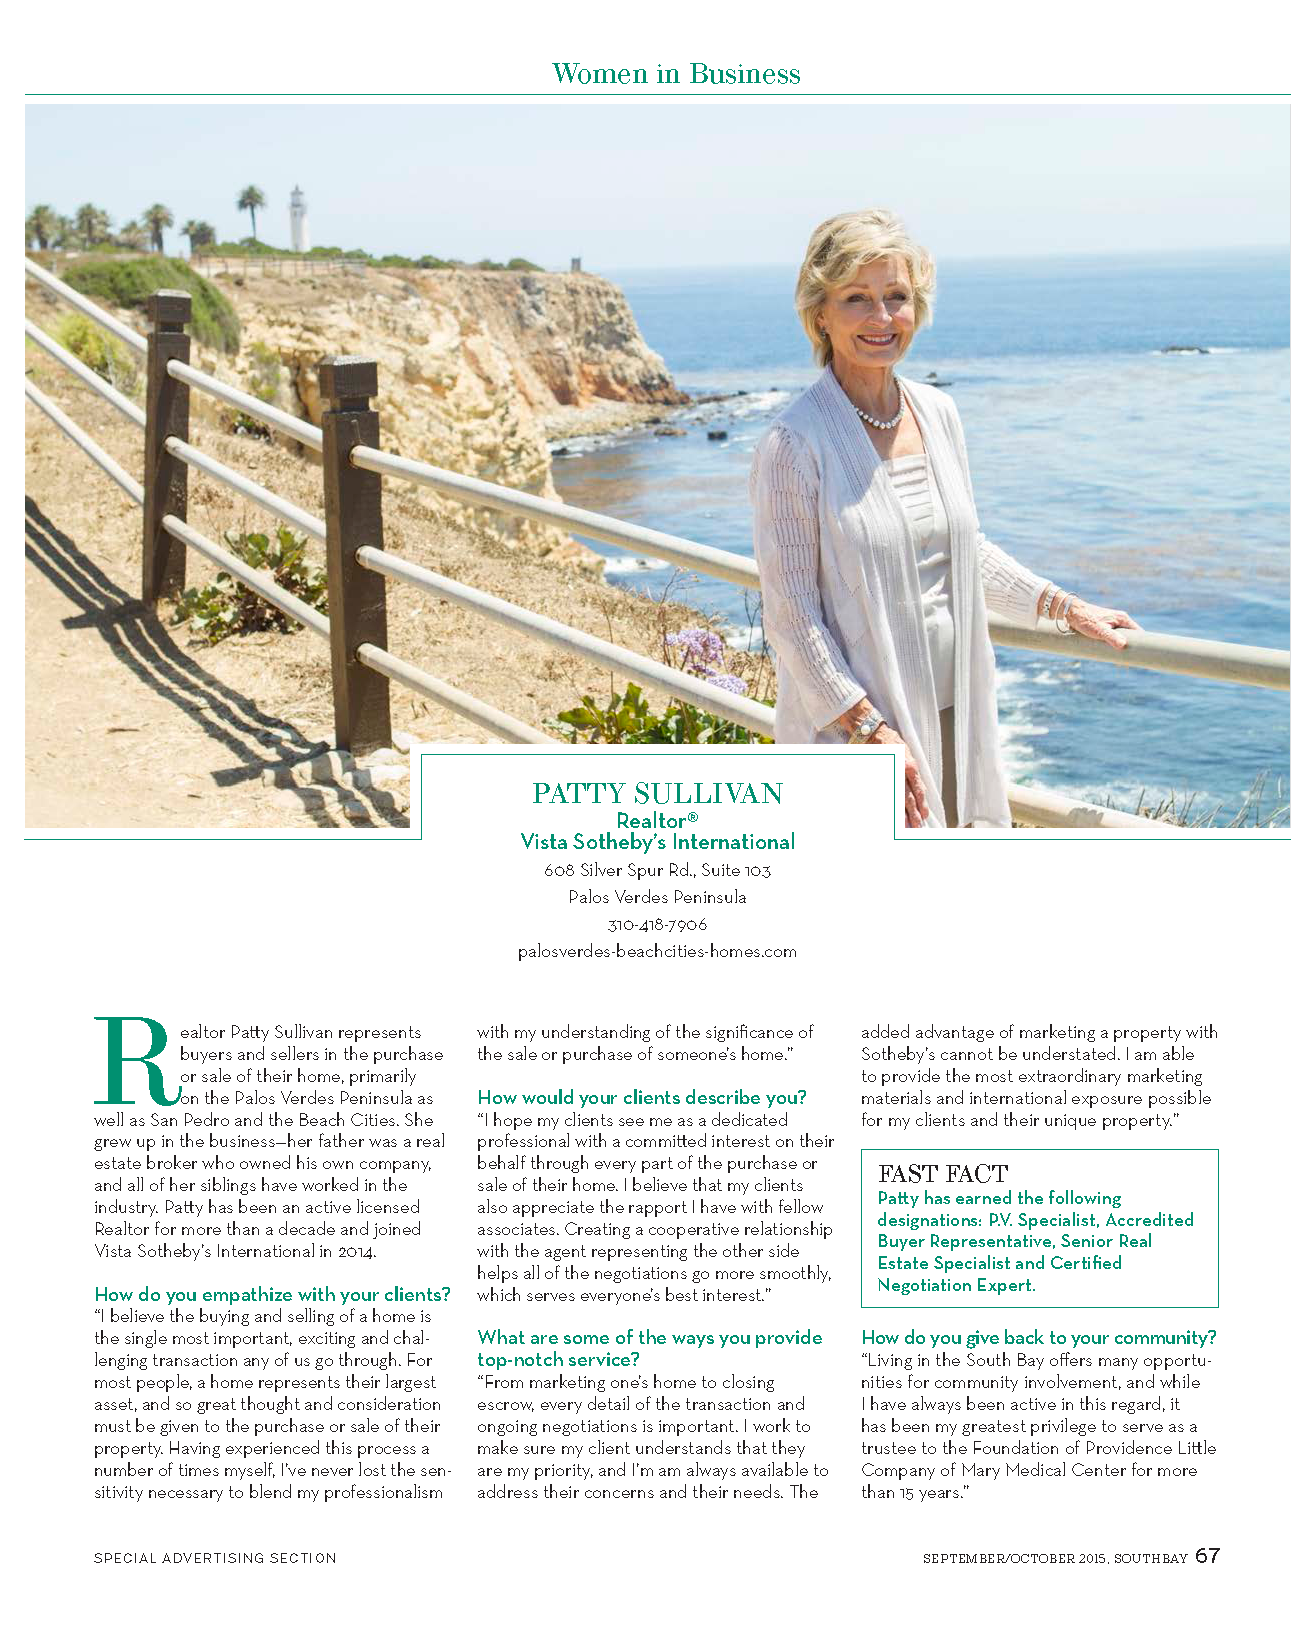 Patty Sullivan Women in Business Profile Southbay Magazine Fall 2015